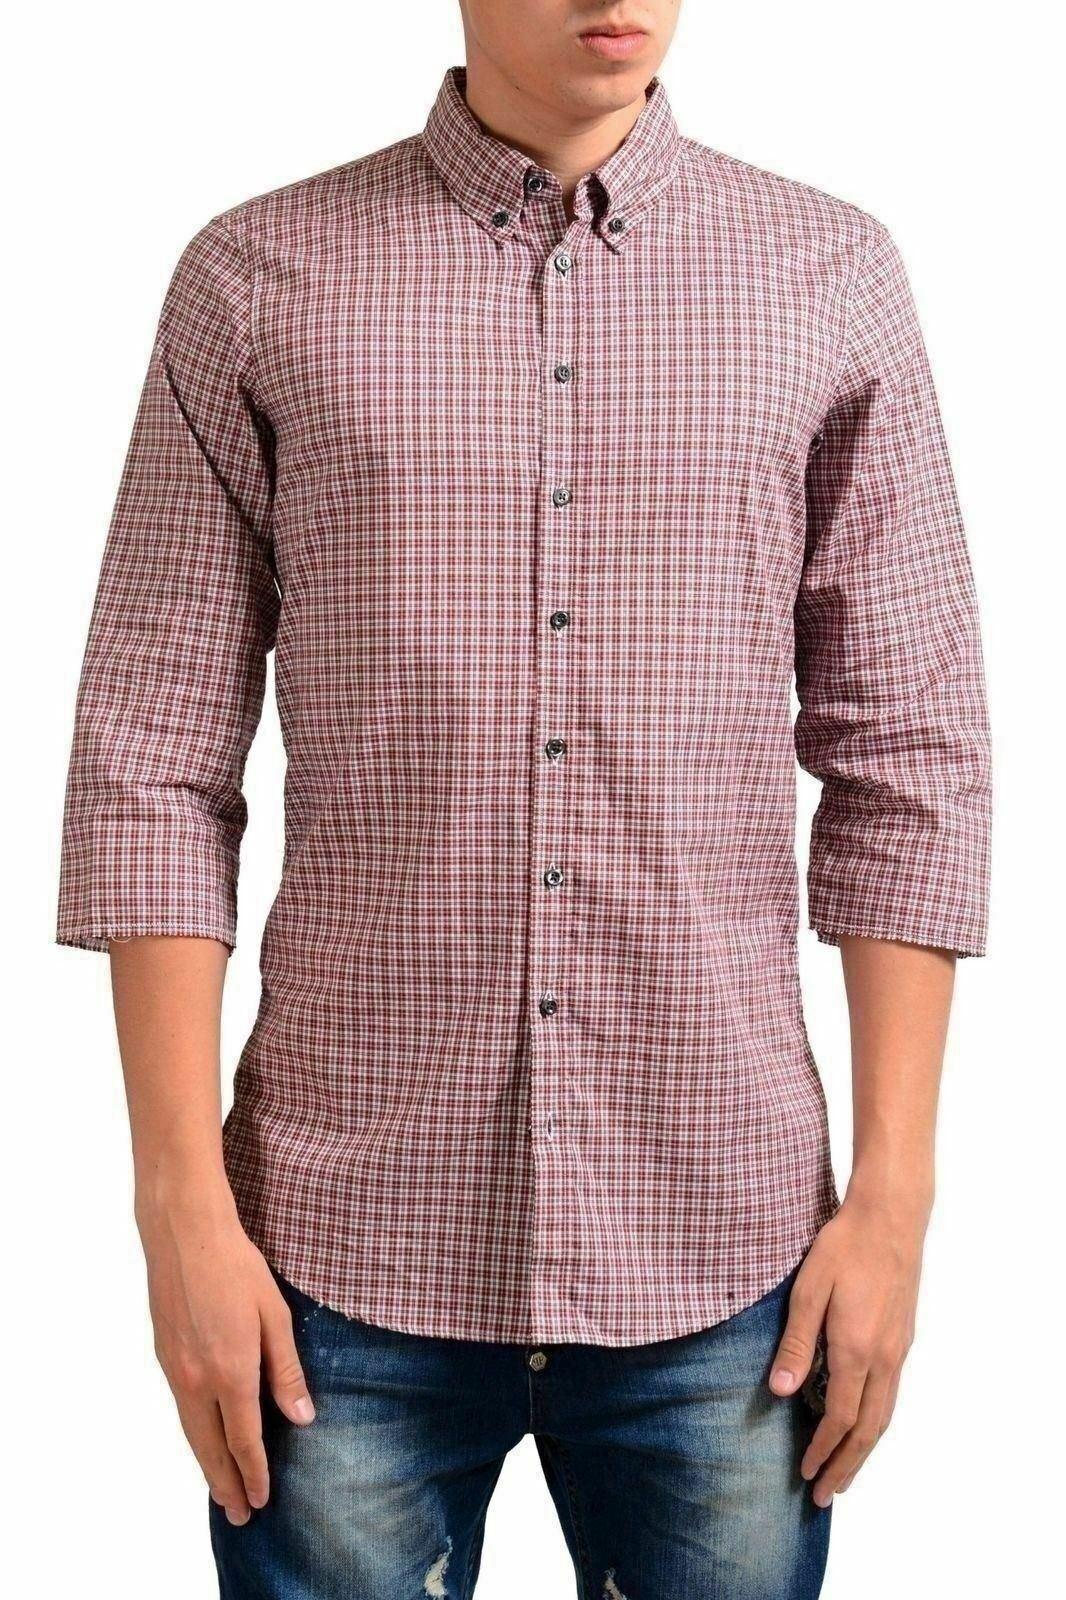 Dsquared2 Men's Plaid 3 4 Sleeve Casual Shirt US S IT 48